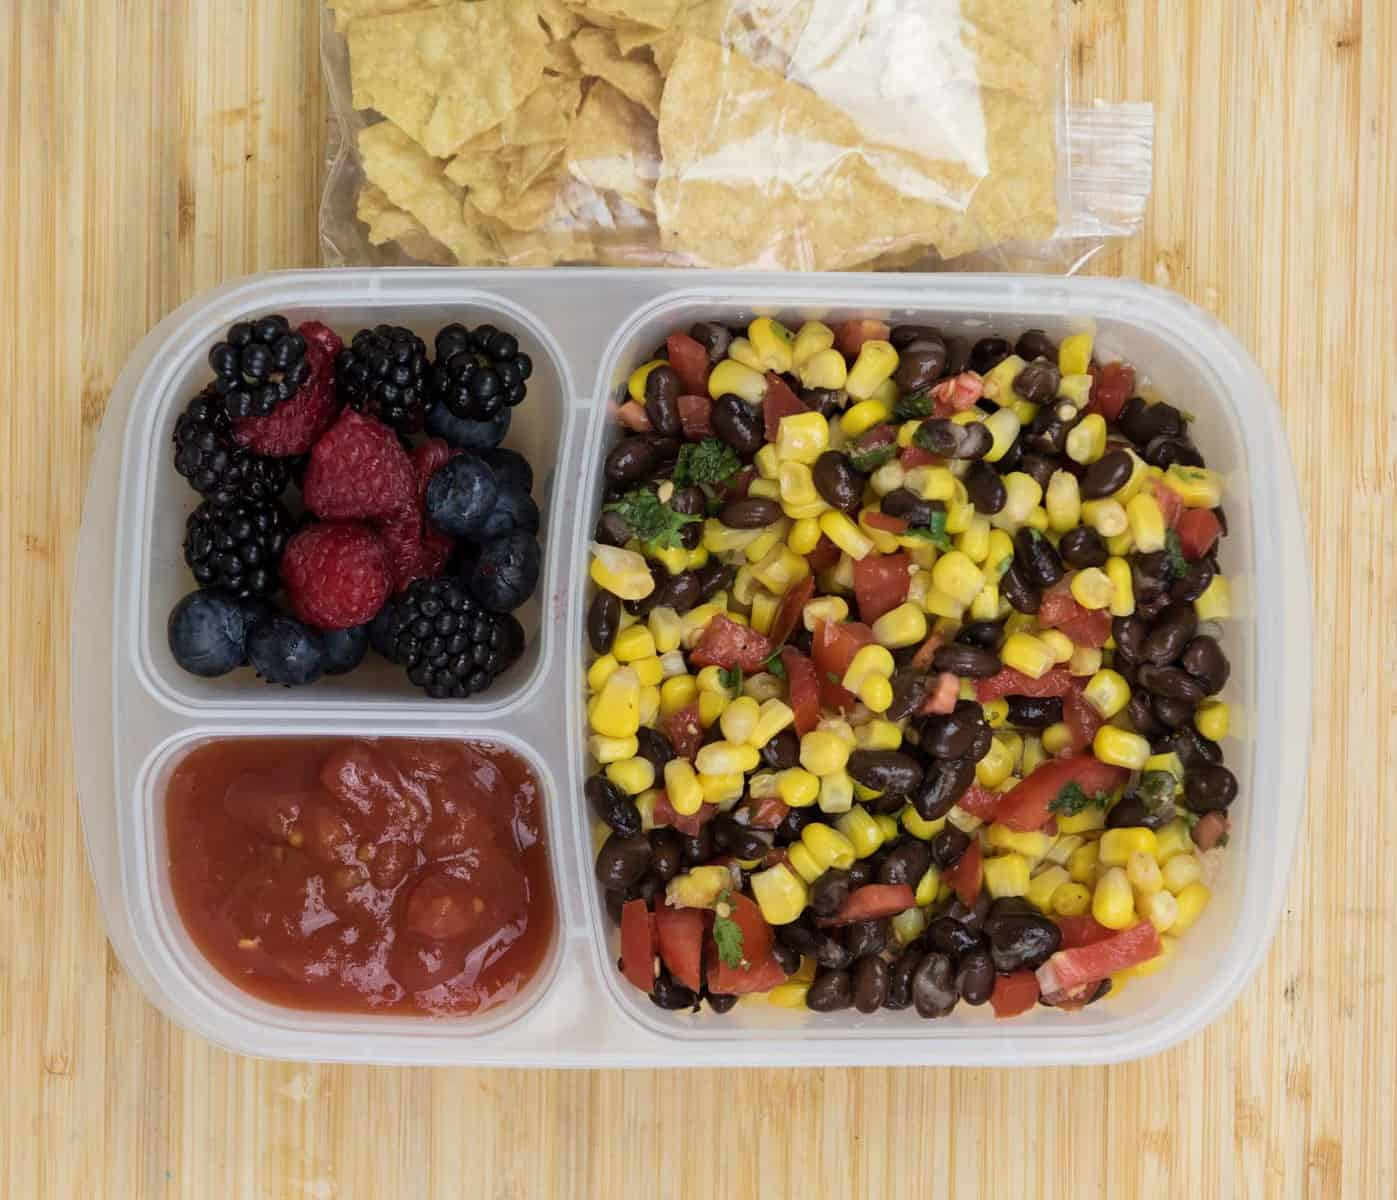 Lunch Box Ideas - Corn and Bean Chip Dip Lunch Box